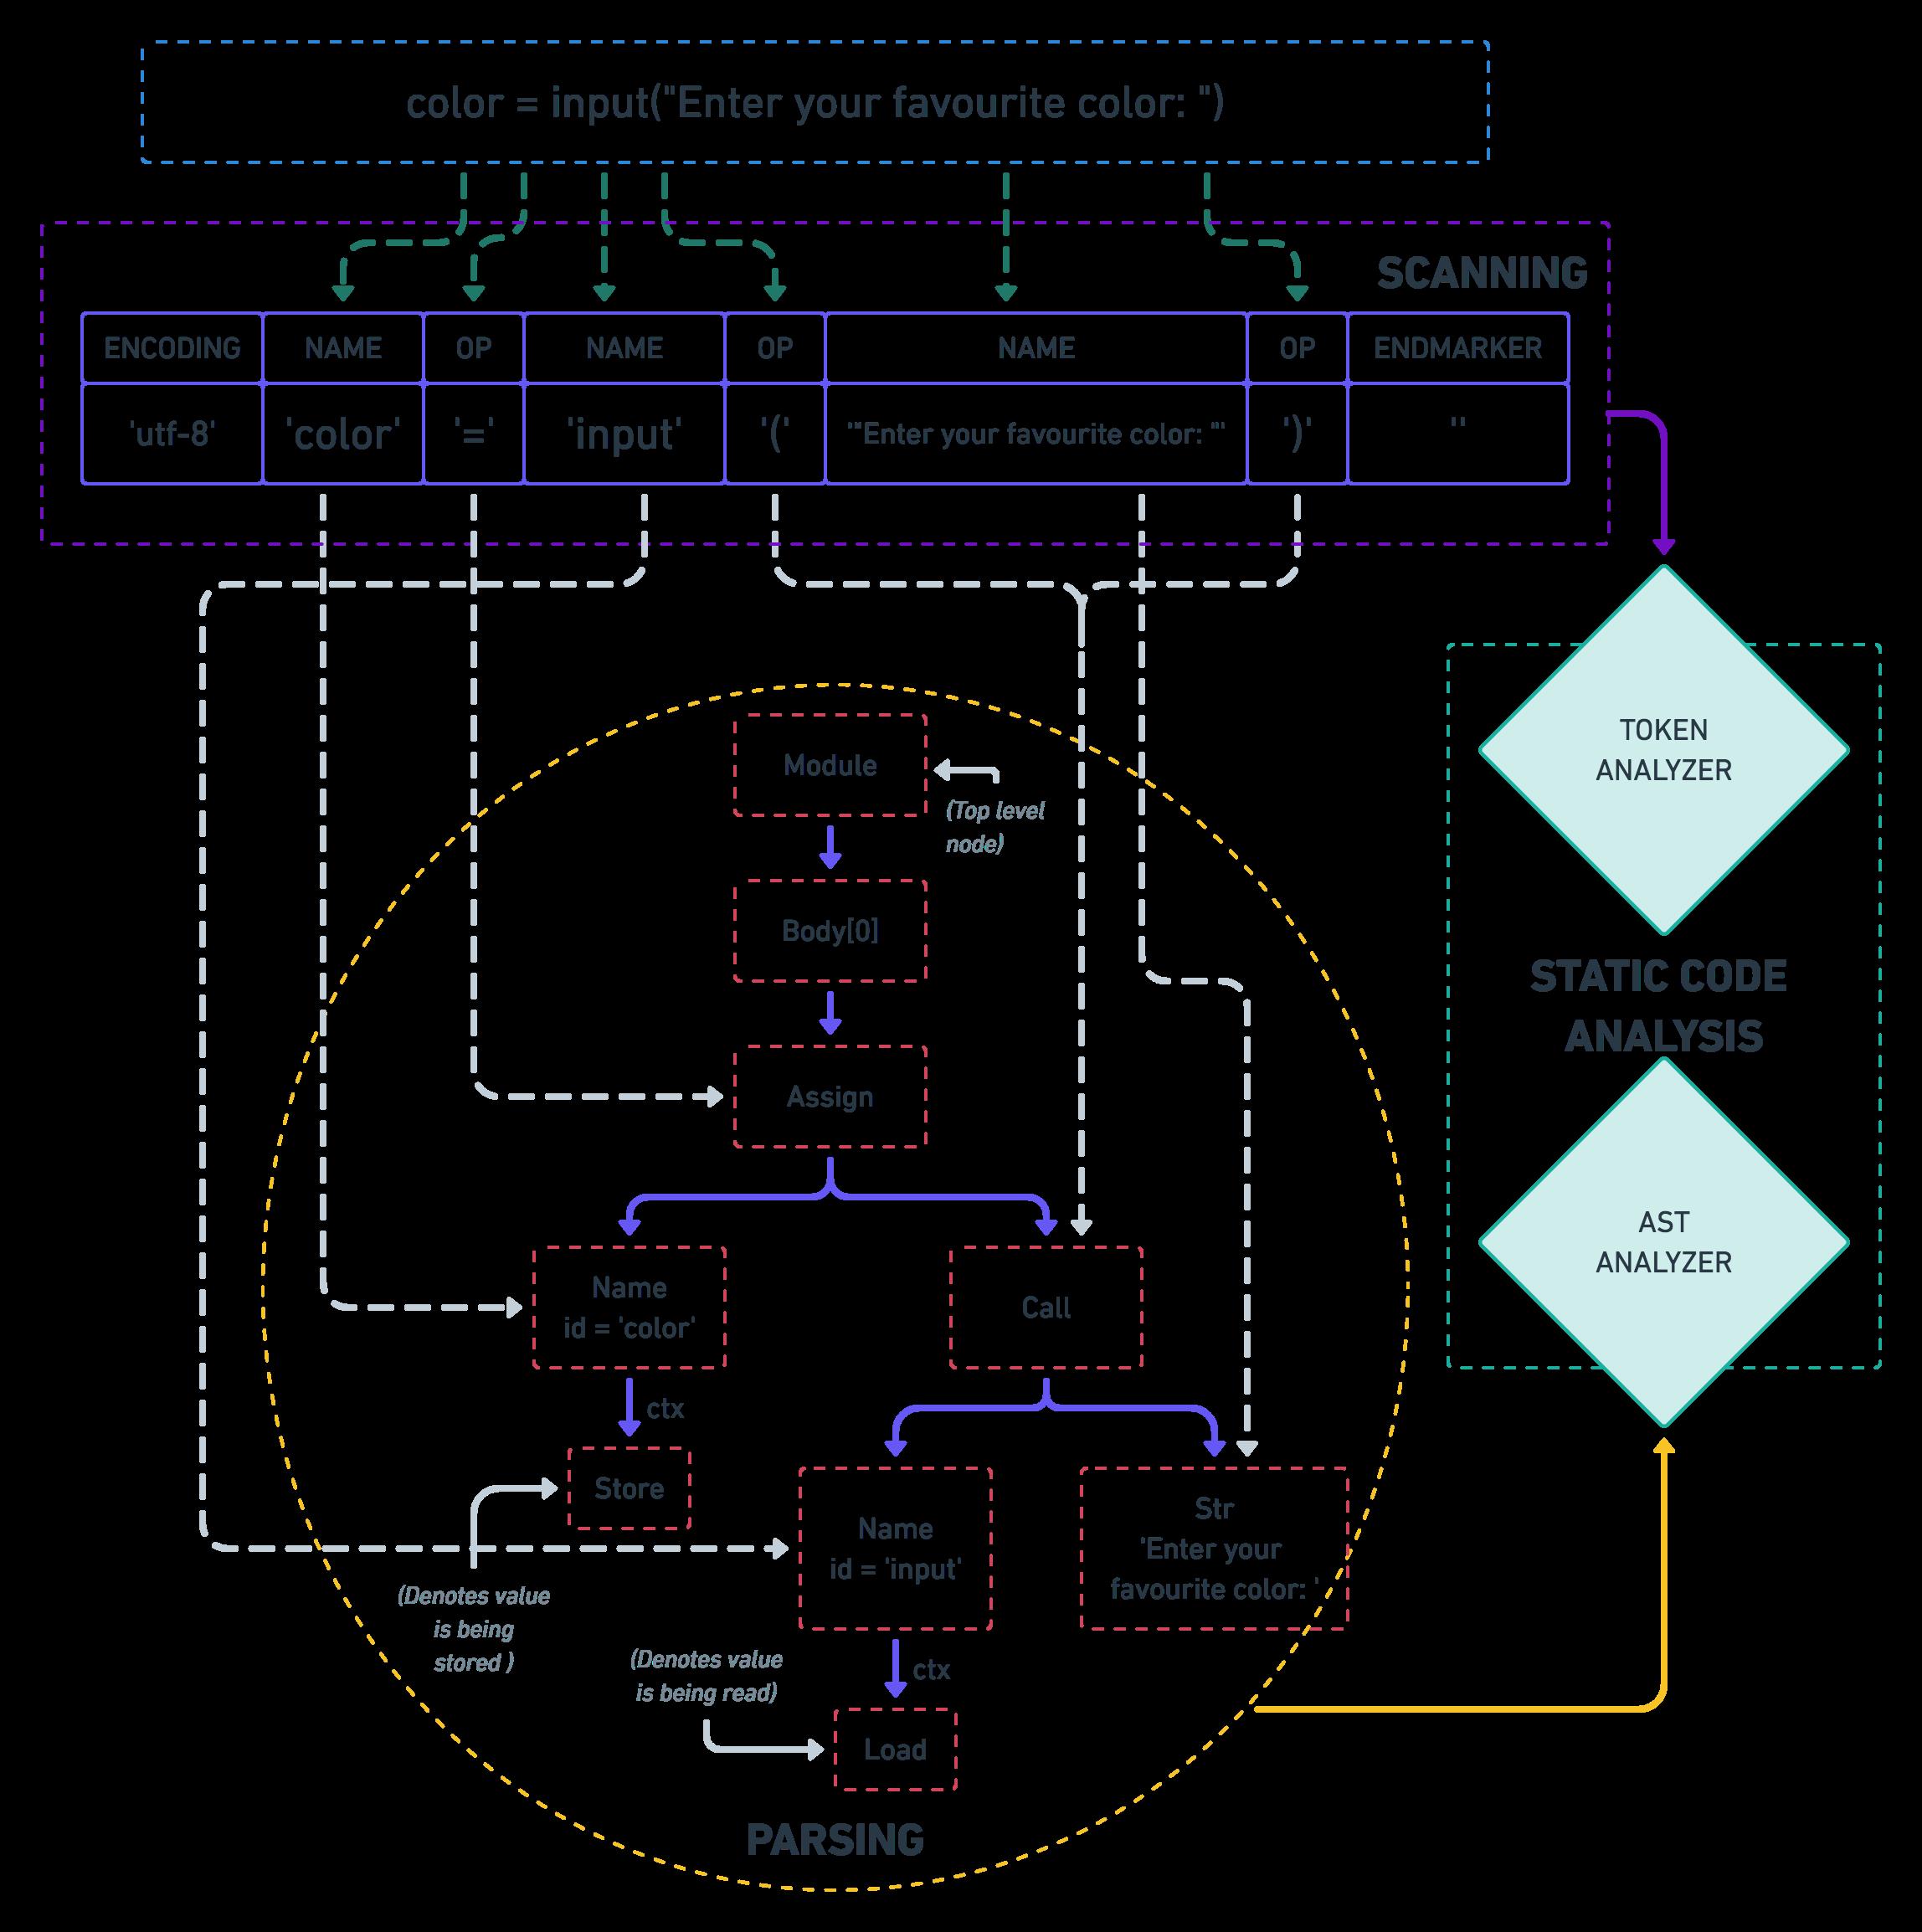 static analysis workflow